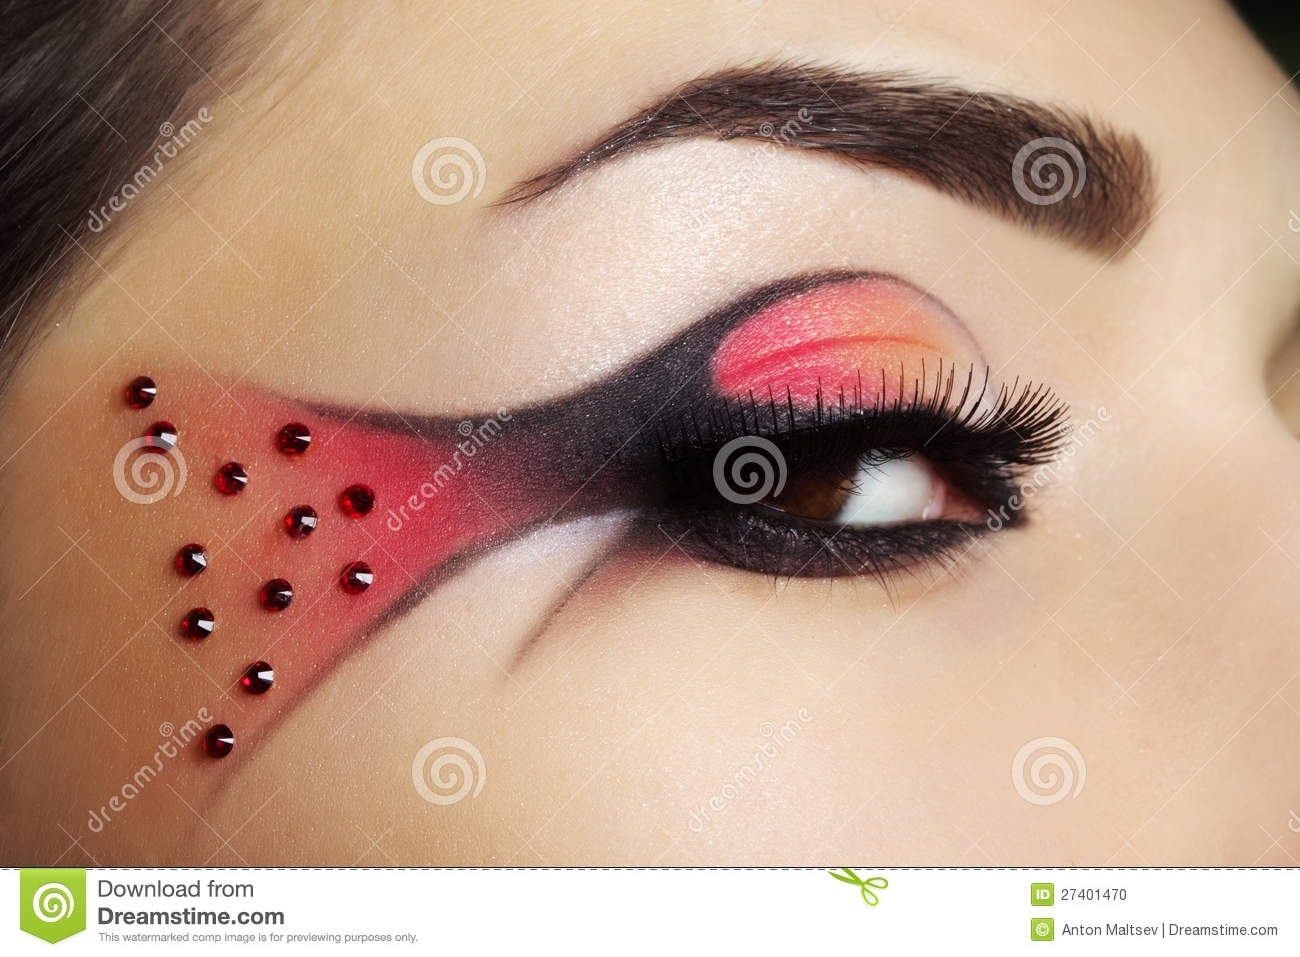 Creative Eye Make-Up Stock Photo. Image Of Eyebrow, Shadows - 27401470 in Download Eye Makeup Images